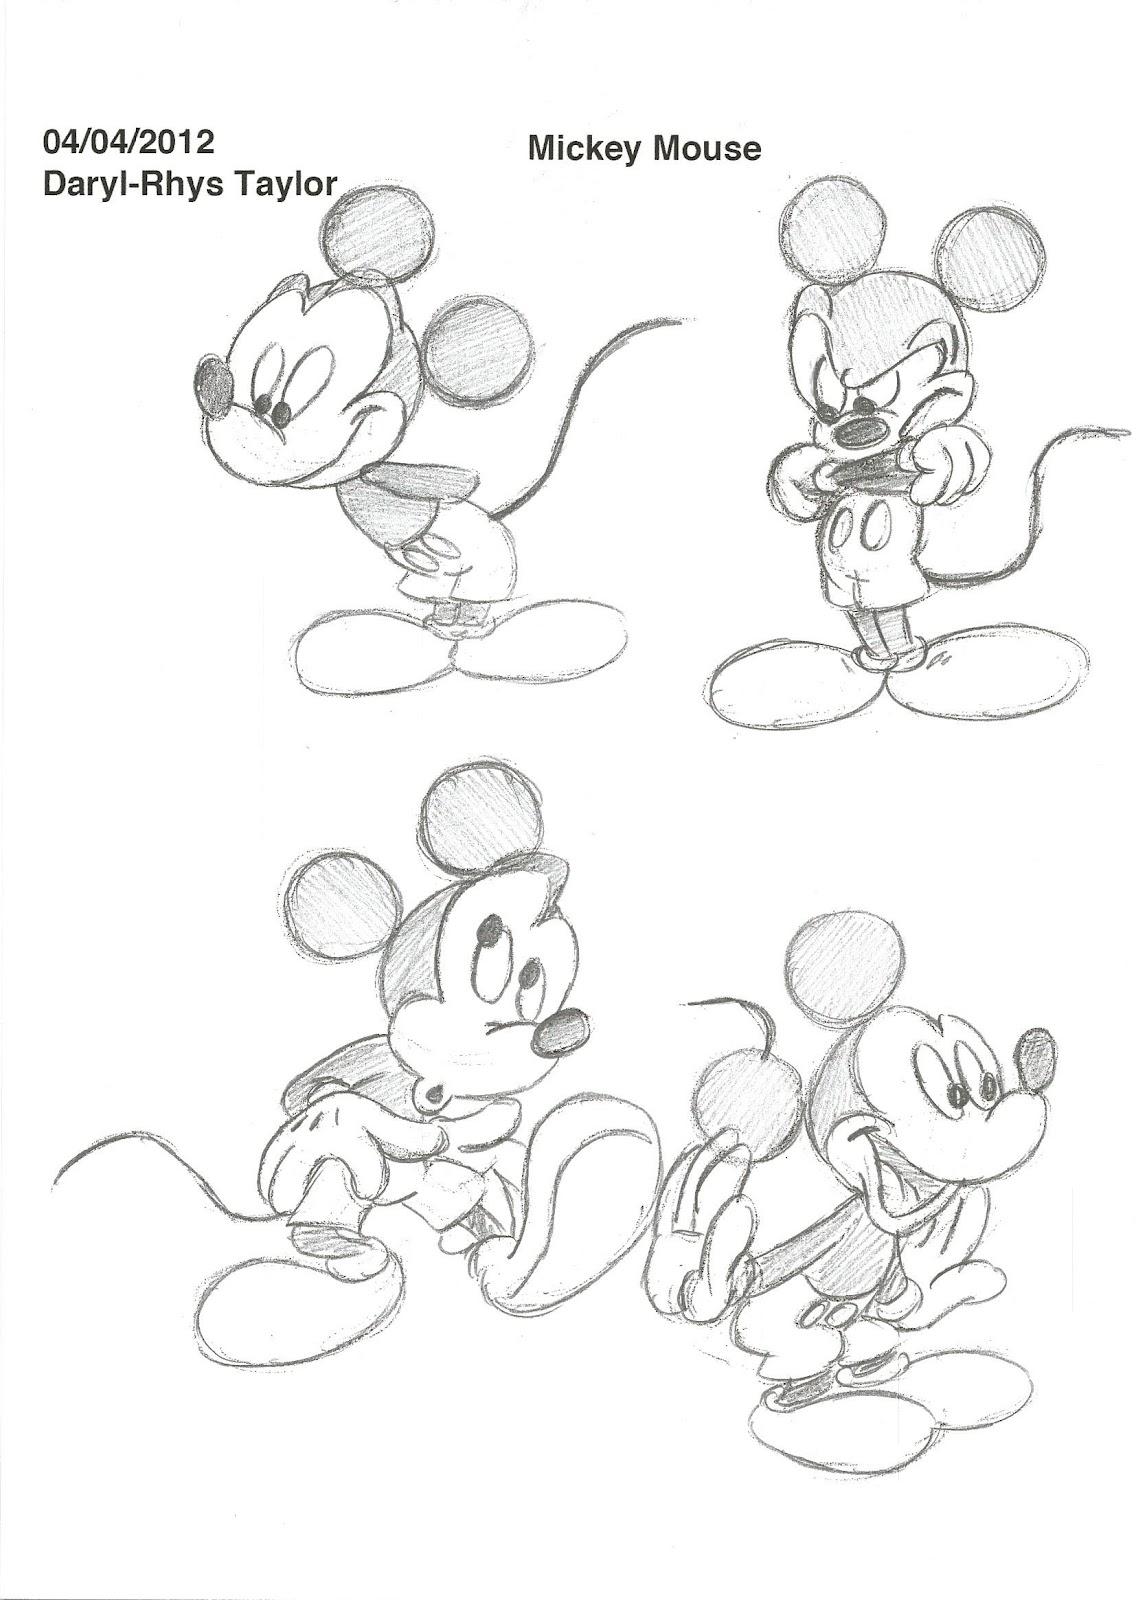 Animated Heads: Disney Consumer Products Portfolio